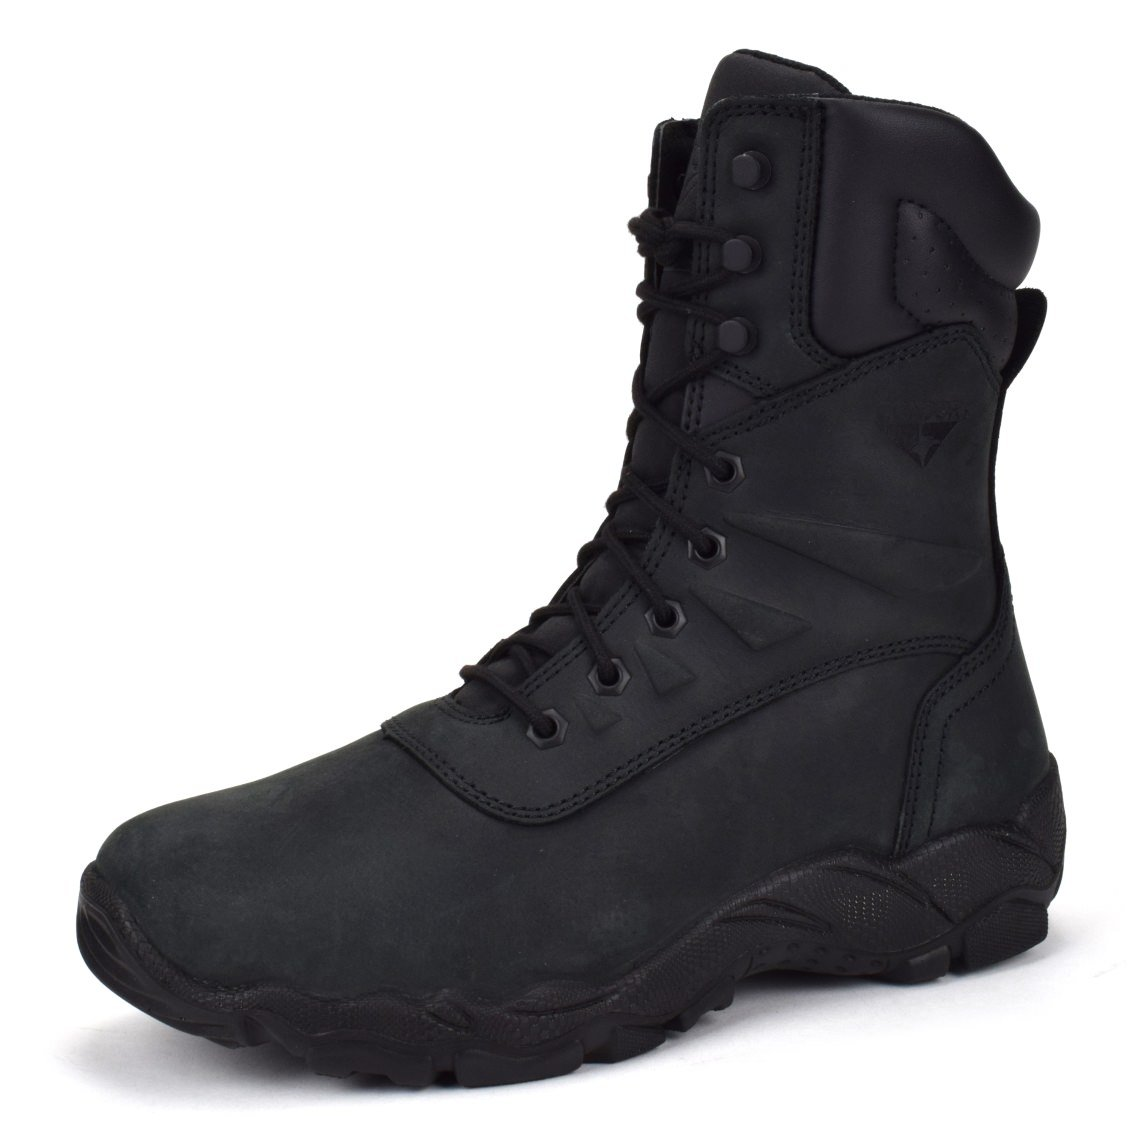 CONDOR Dakota Men's 8'' Steel Toe Work Boot - Black Nubuck, Size 11 E US